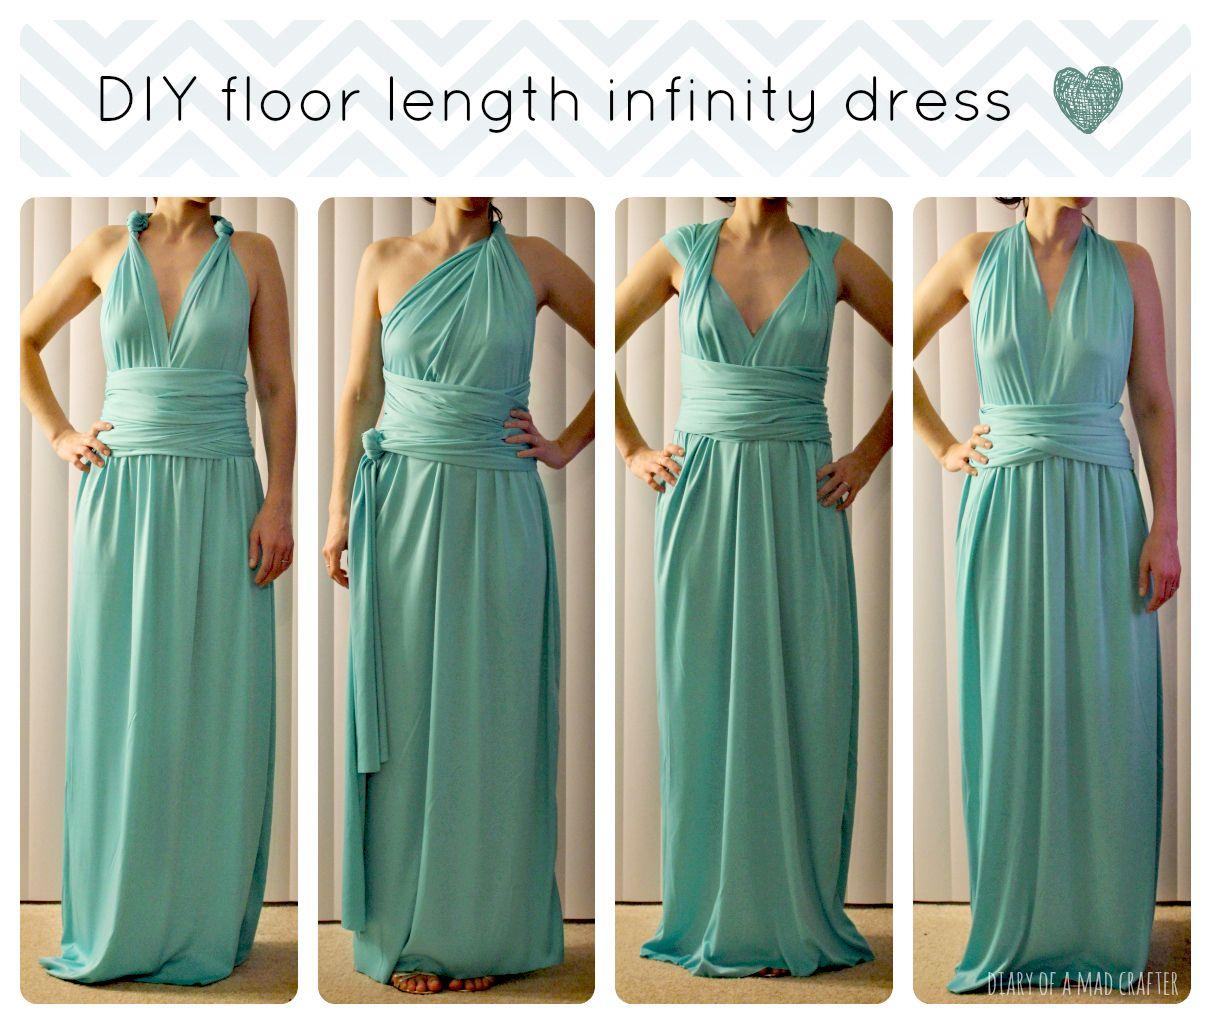 DIY Floor Length Infinity Dress Dress sewing tutorials